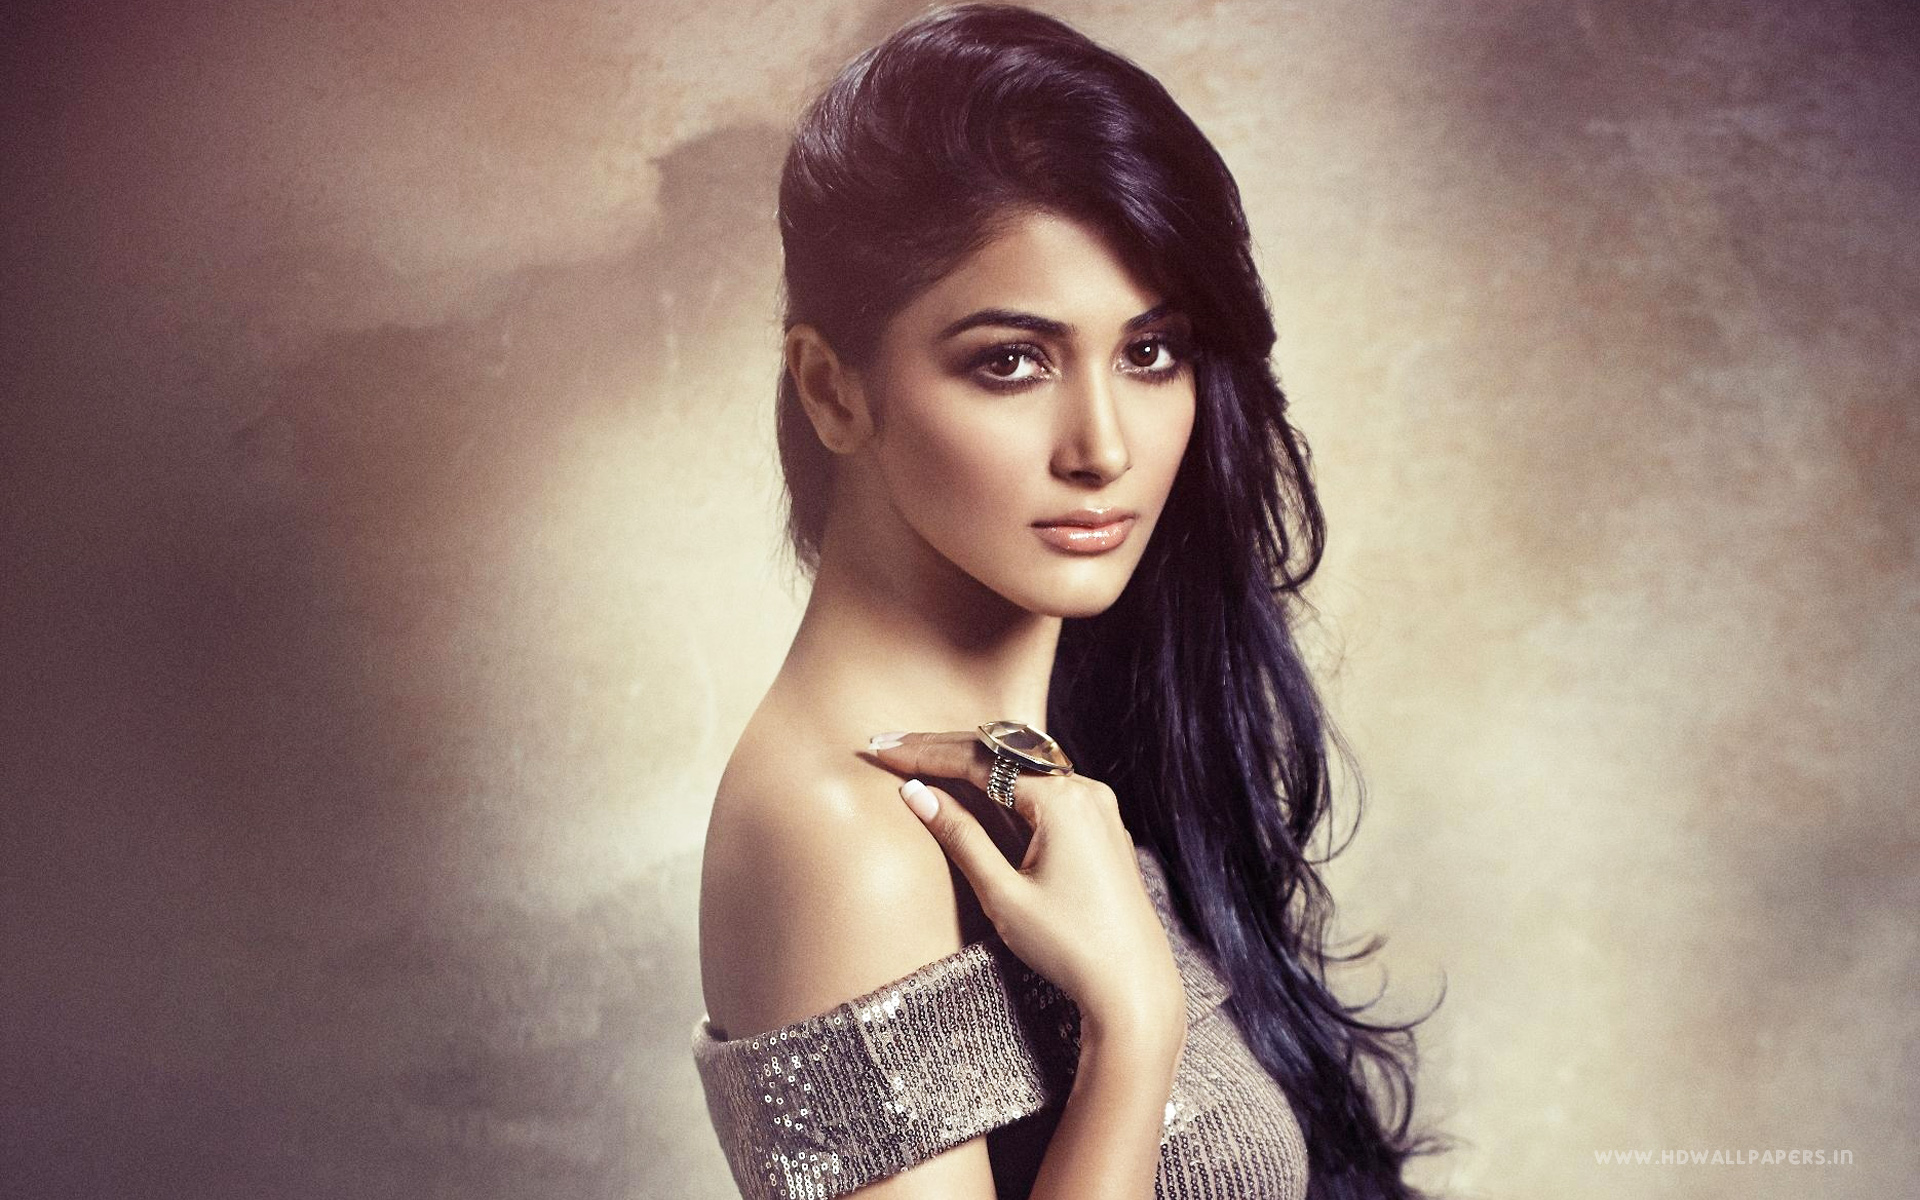 Pooja Hegde Bollywood Actress Wallpapers HD Wallpapers 1920x1200